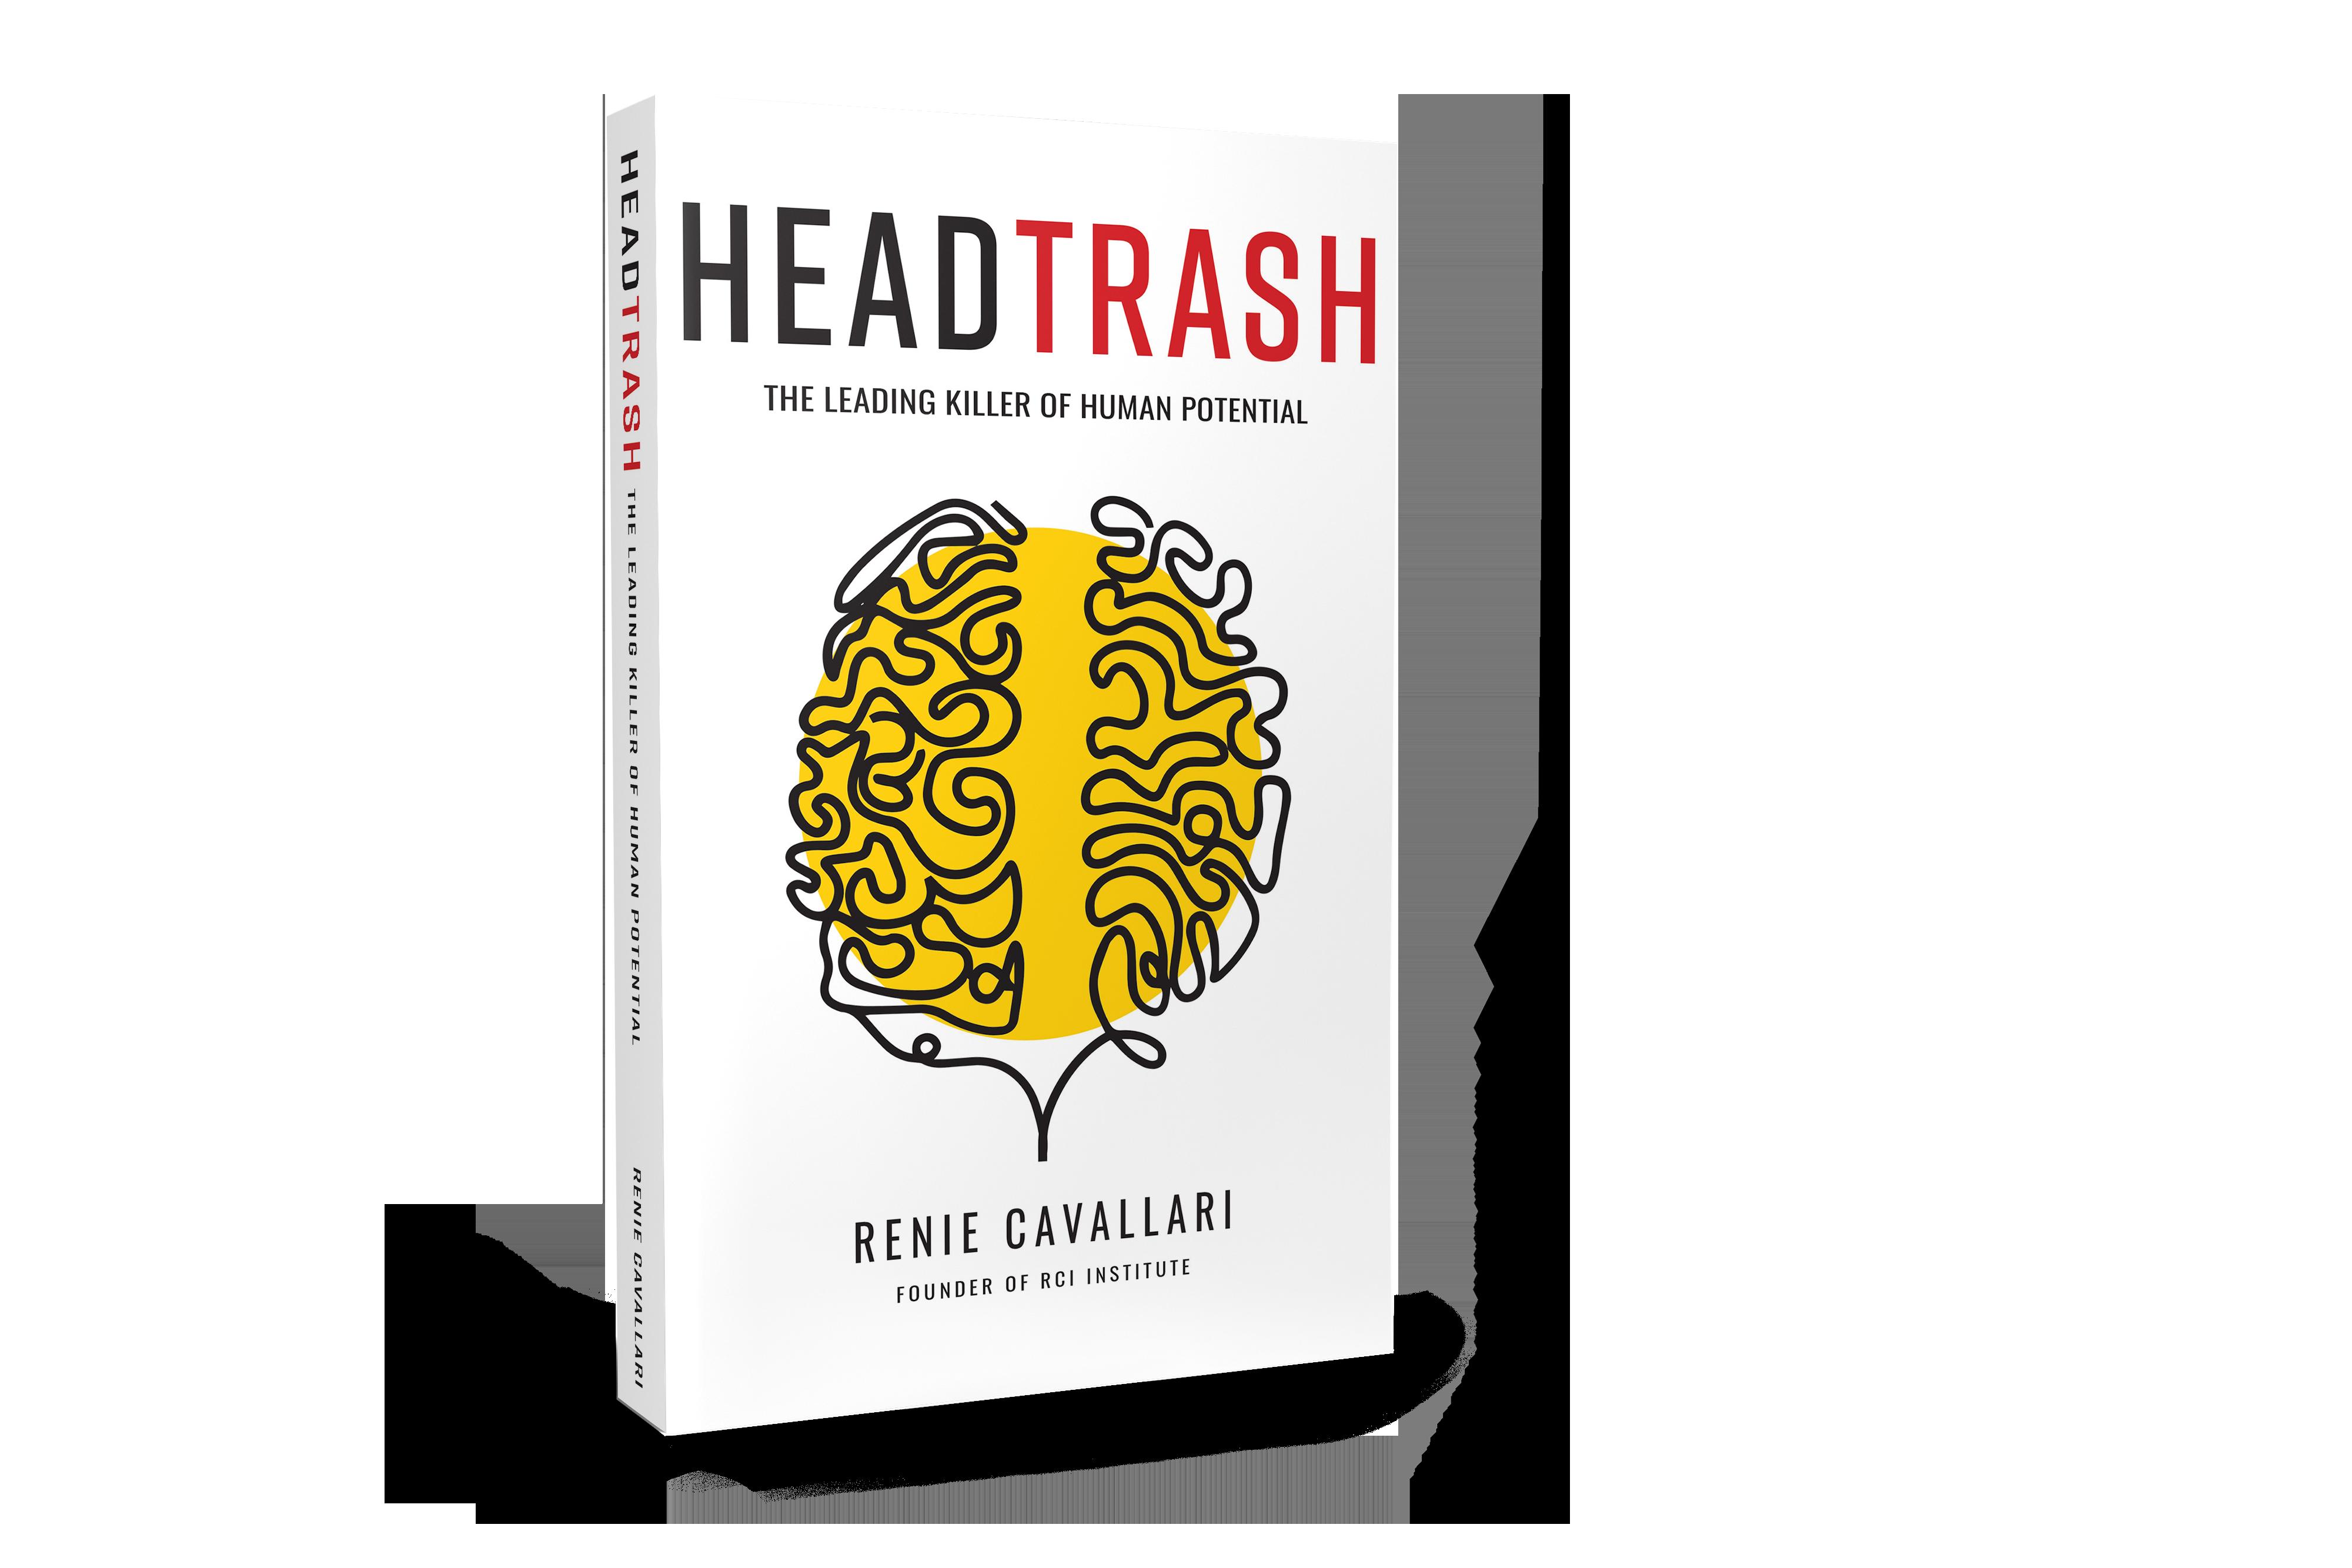 HeadTrash_3D copy